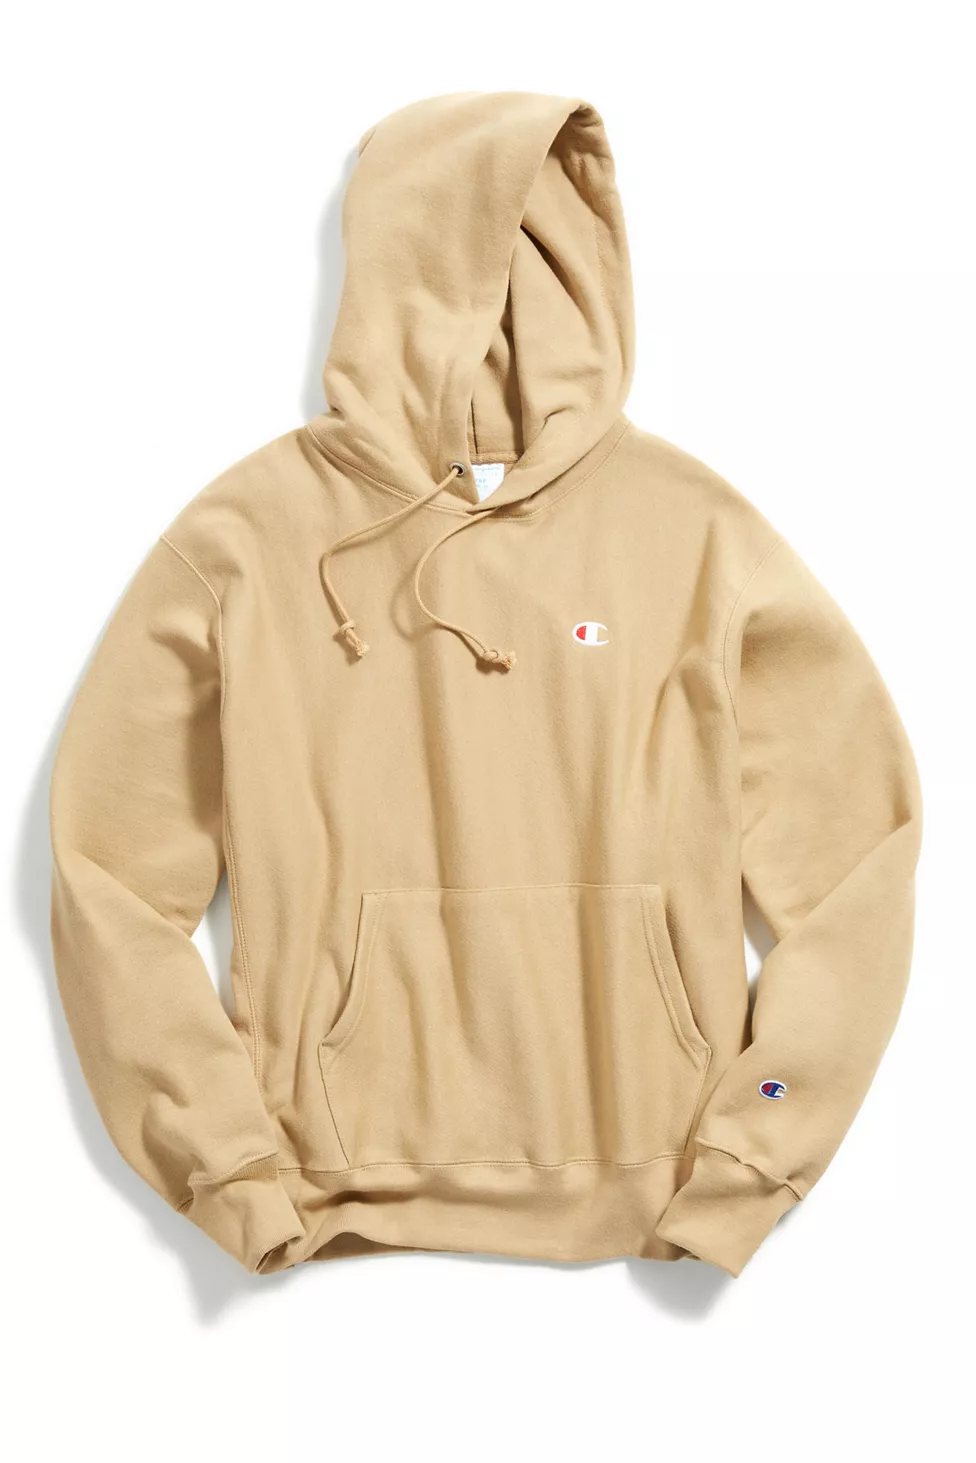 Champion Uo Exclusive Reverse Weave Hoodie Sweatshirt Trendy Hoodies Champion Clothing Mens Champion Hoodie [ 1463 x 976 Pixel ]